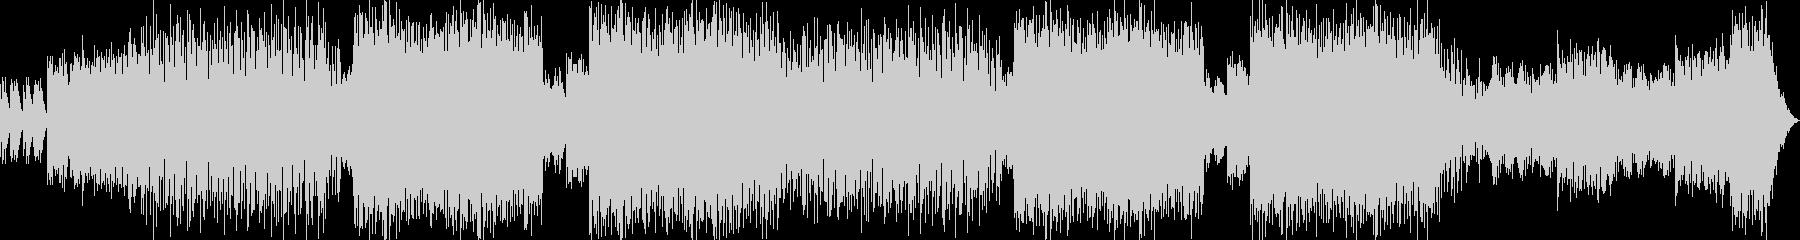 EDM調のBGMの未再生の波形